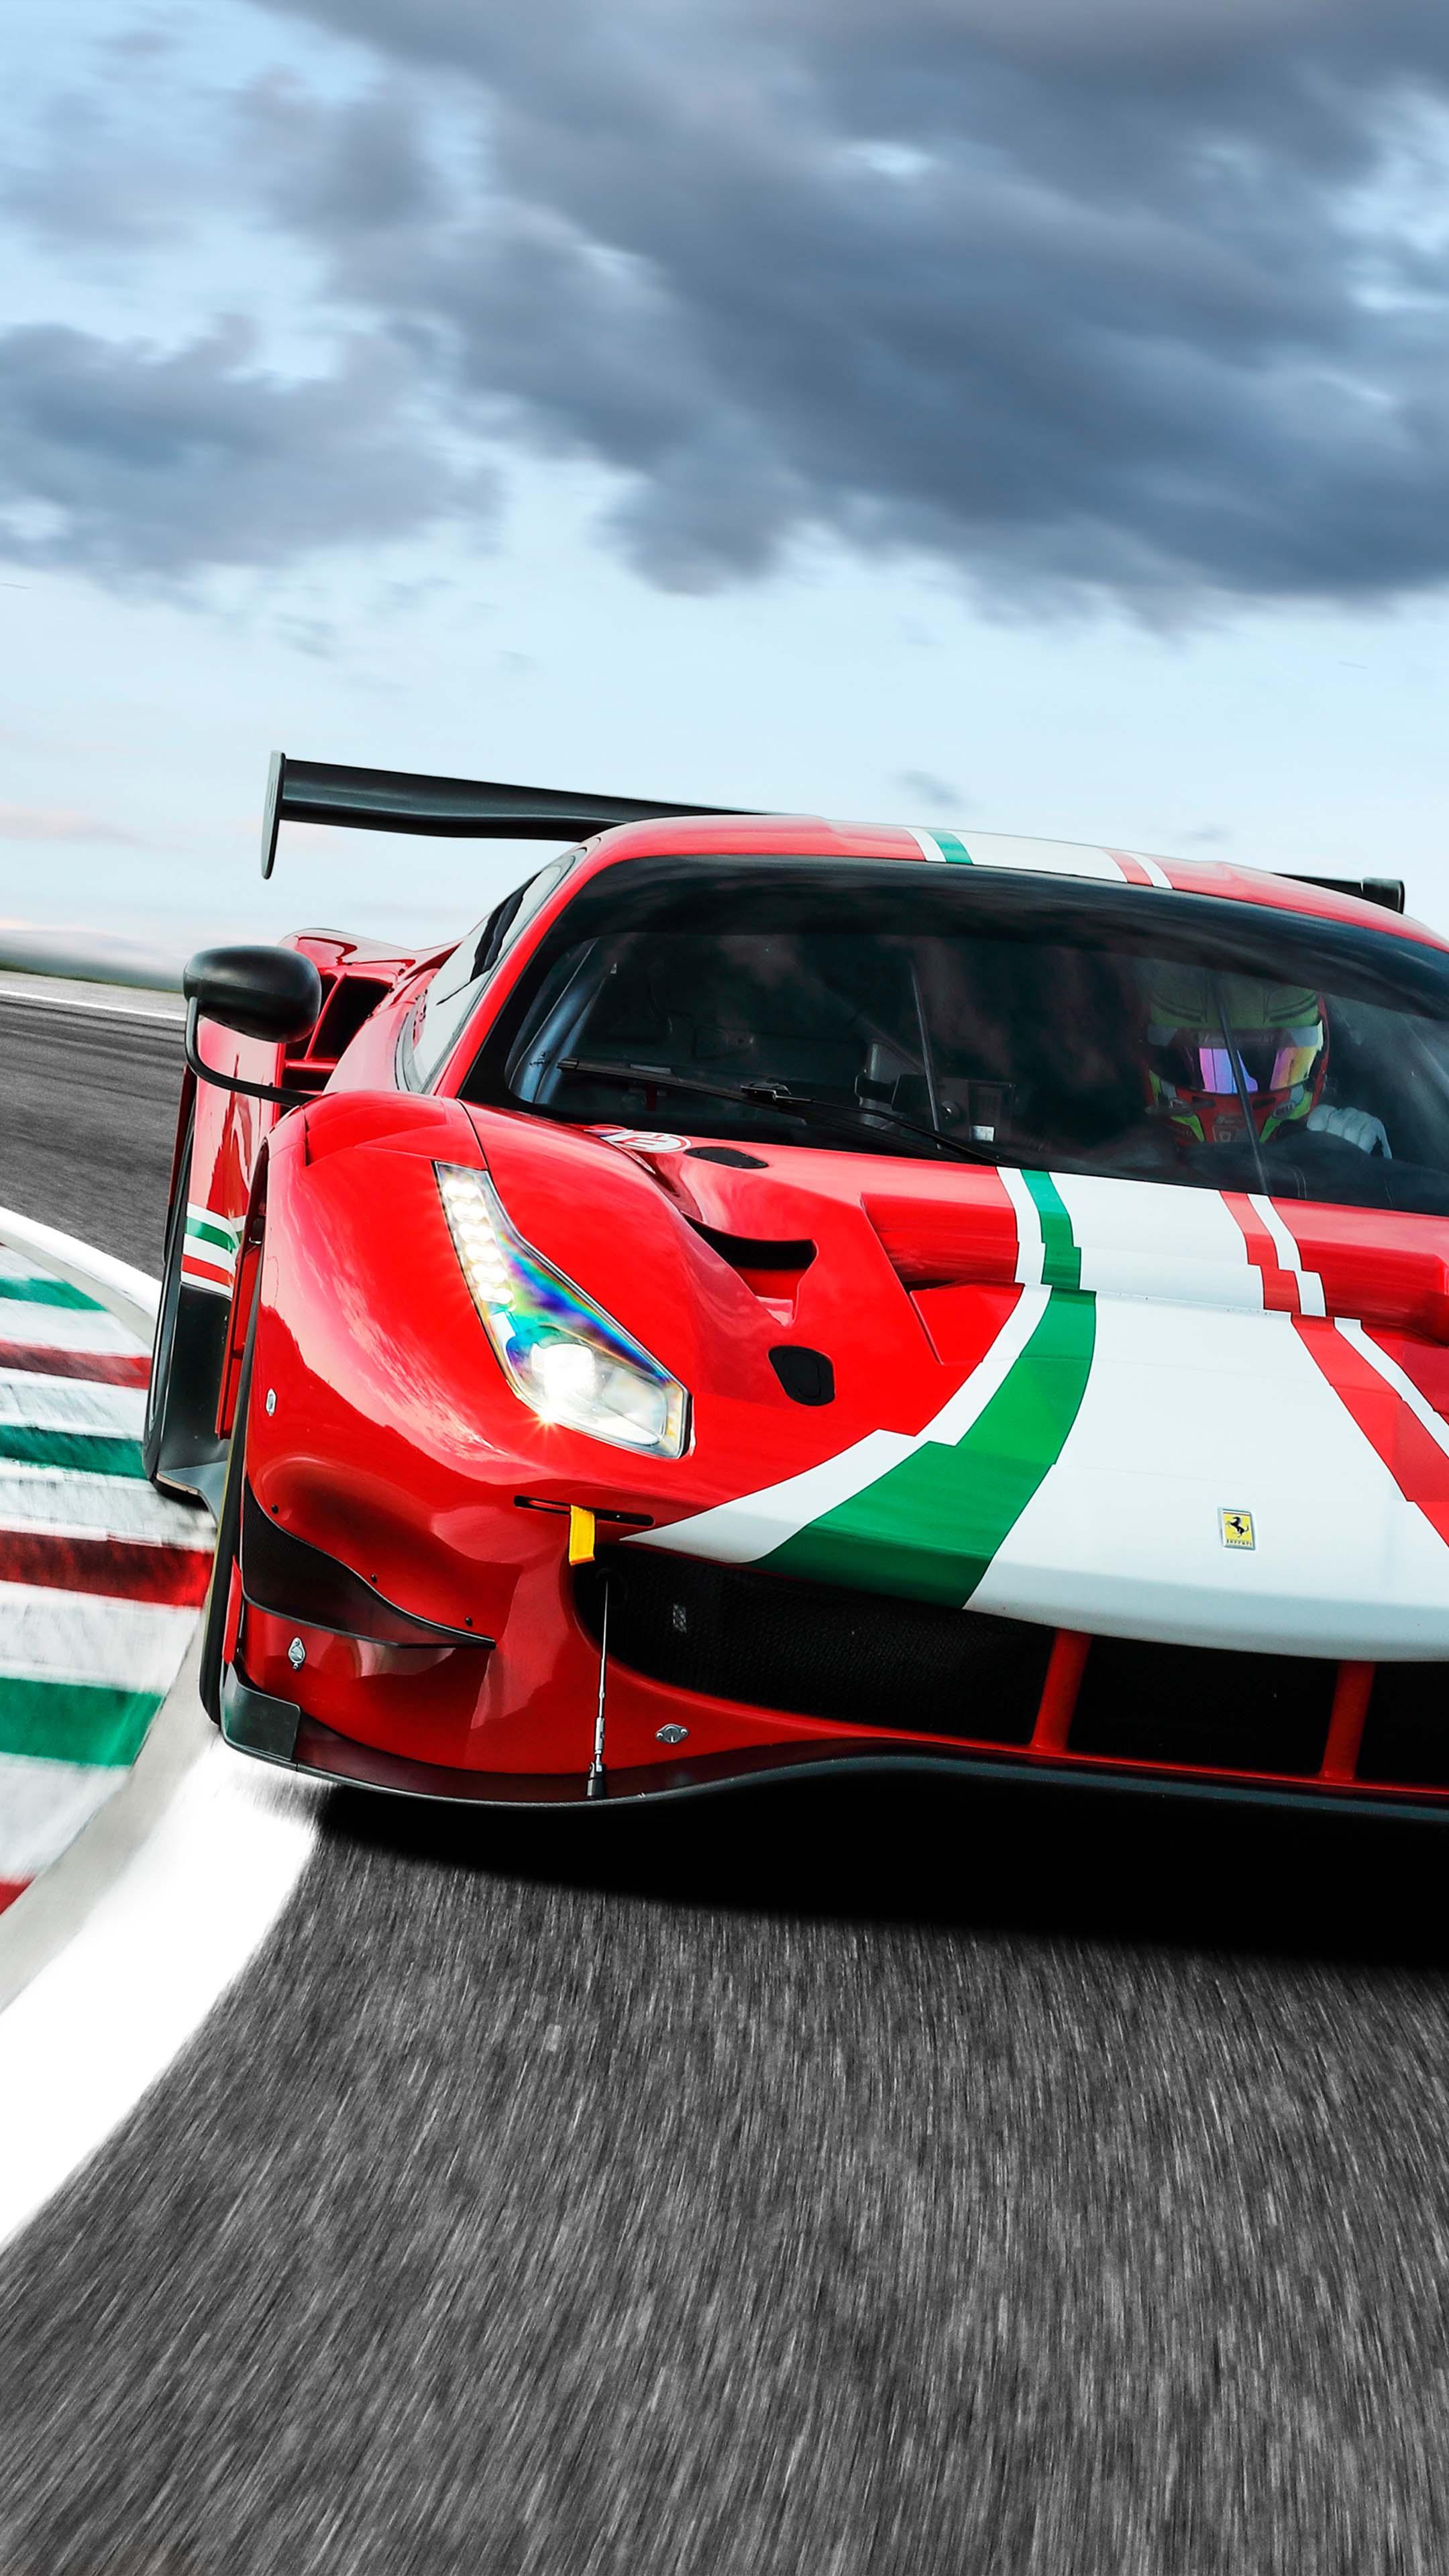 Ferrari 488 Gt3 Evo 2020 4k Ultra Hd Mobile Wallpaper